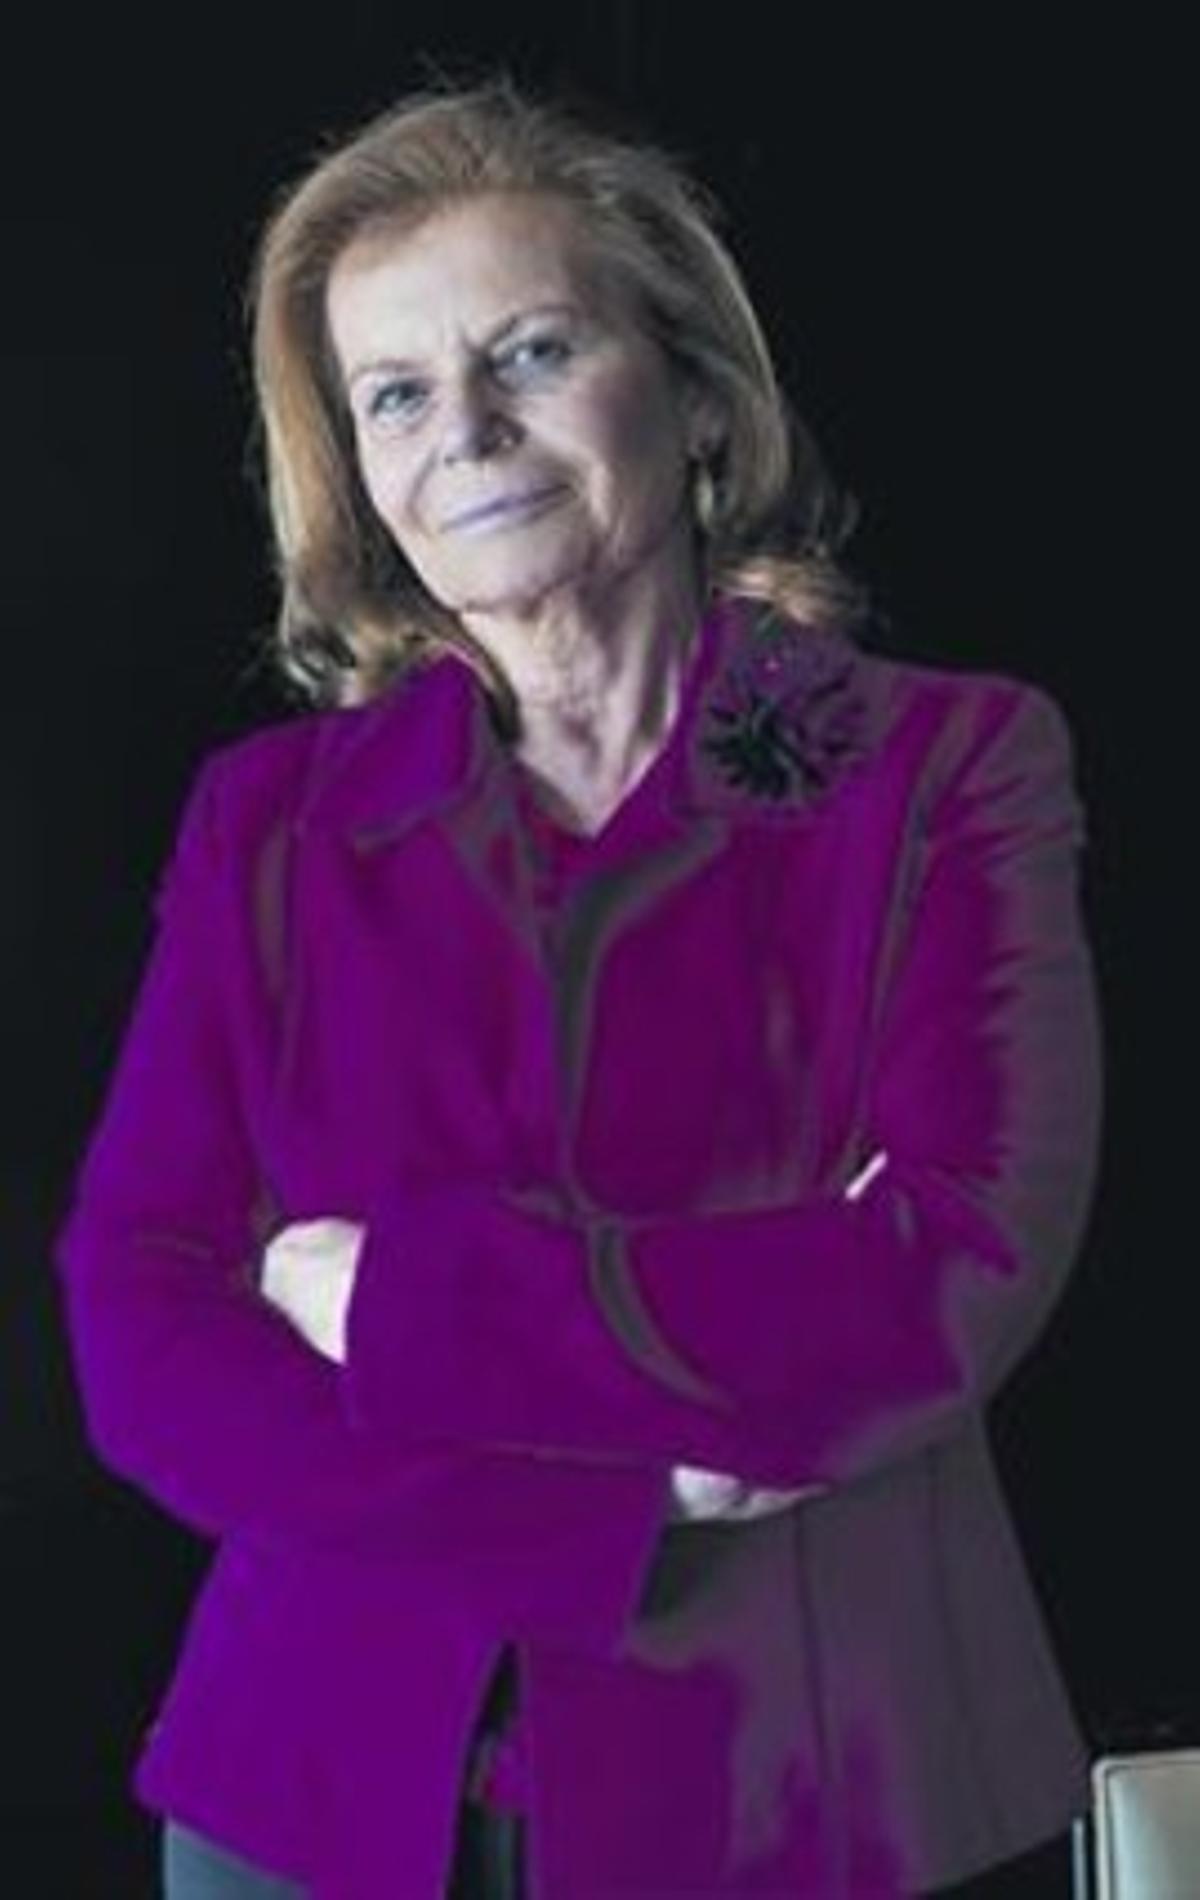 L'escriptora i acadèmica Carme Riera serà premi Trajectòria.